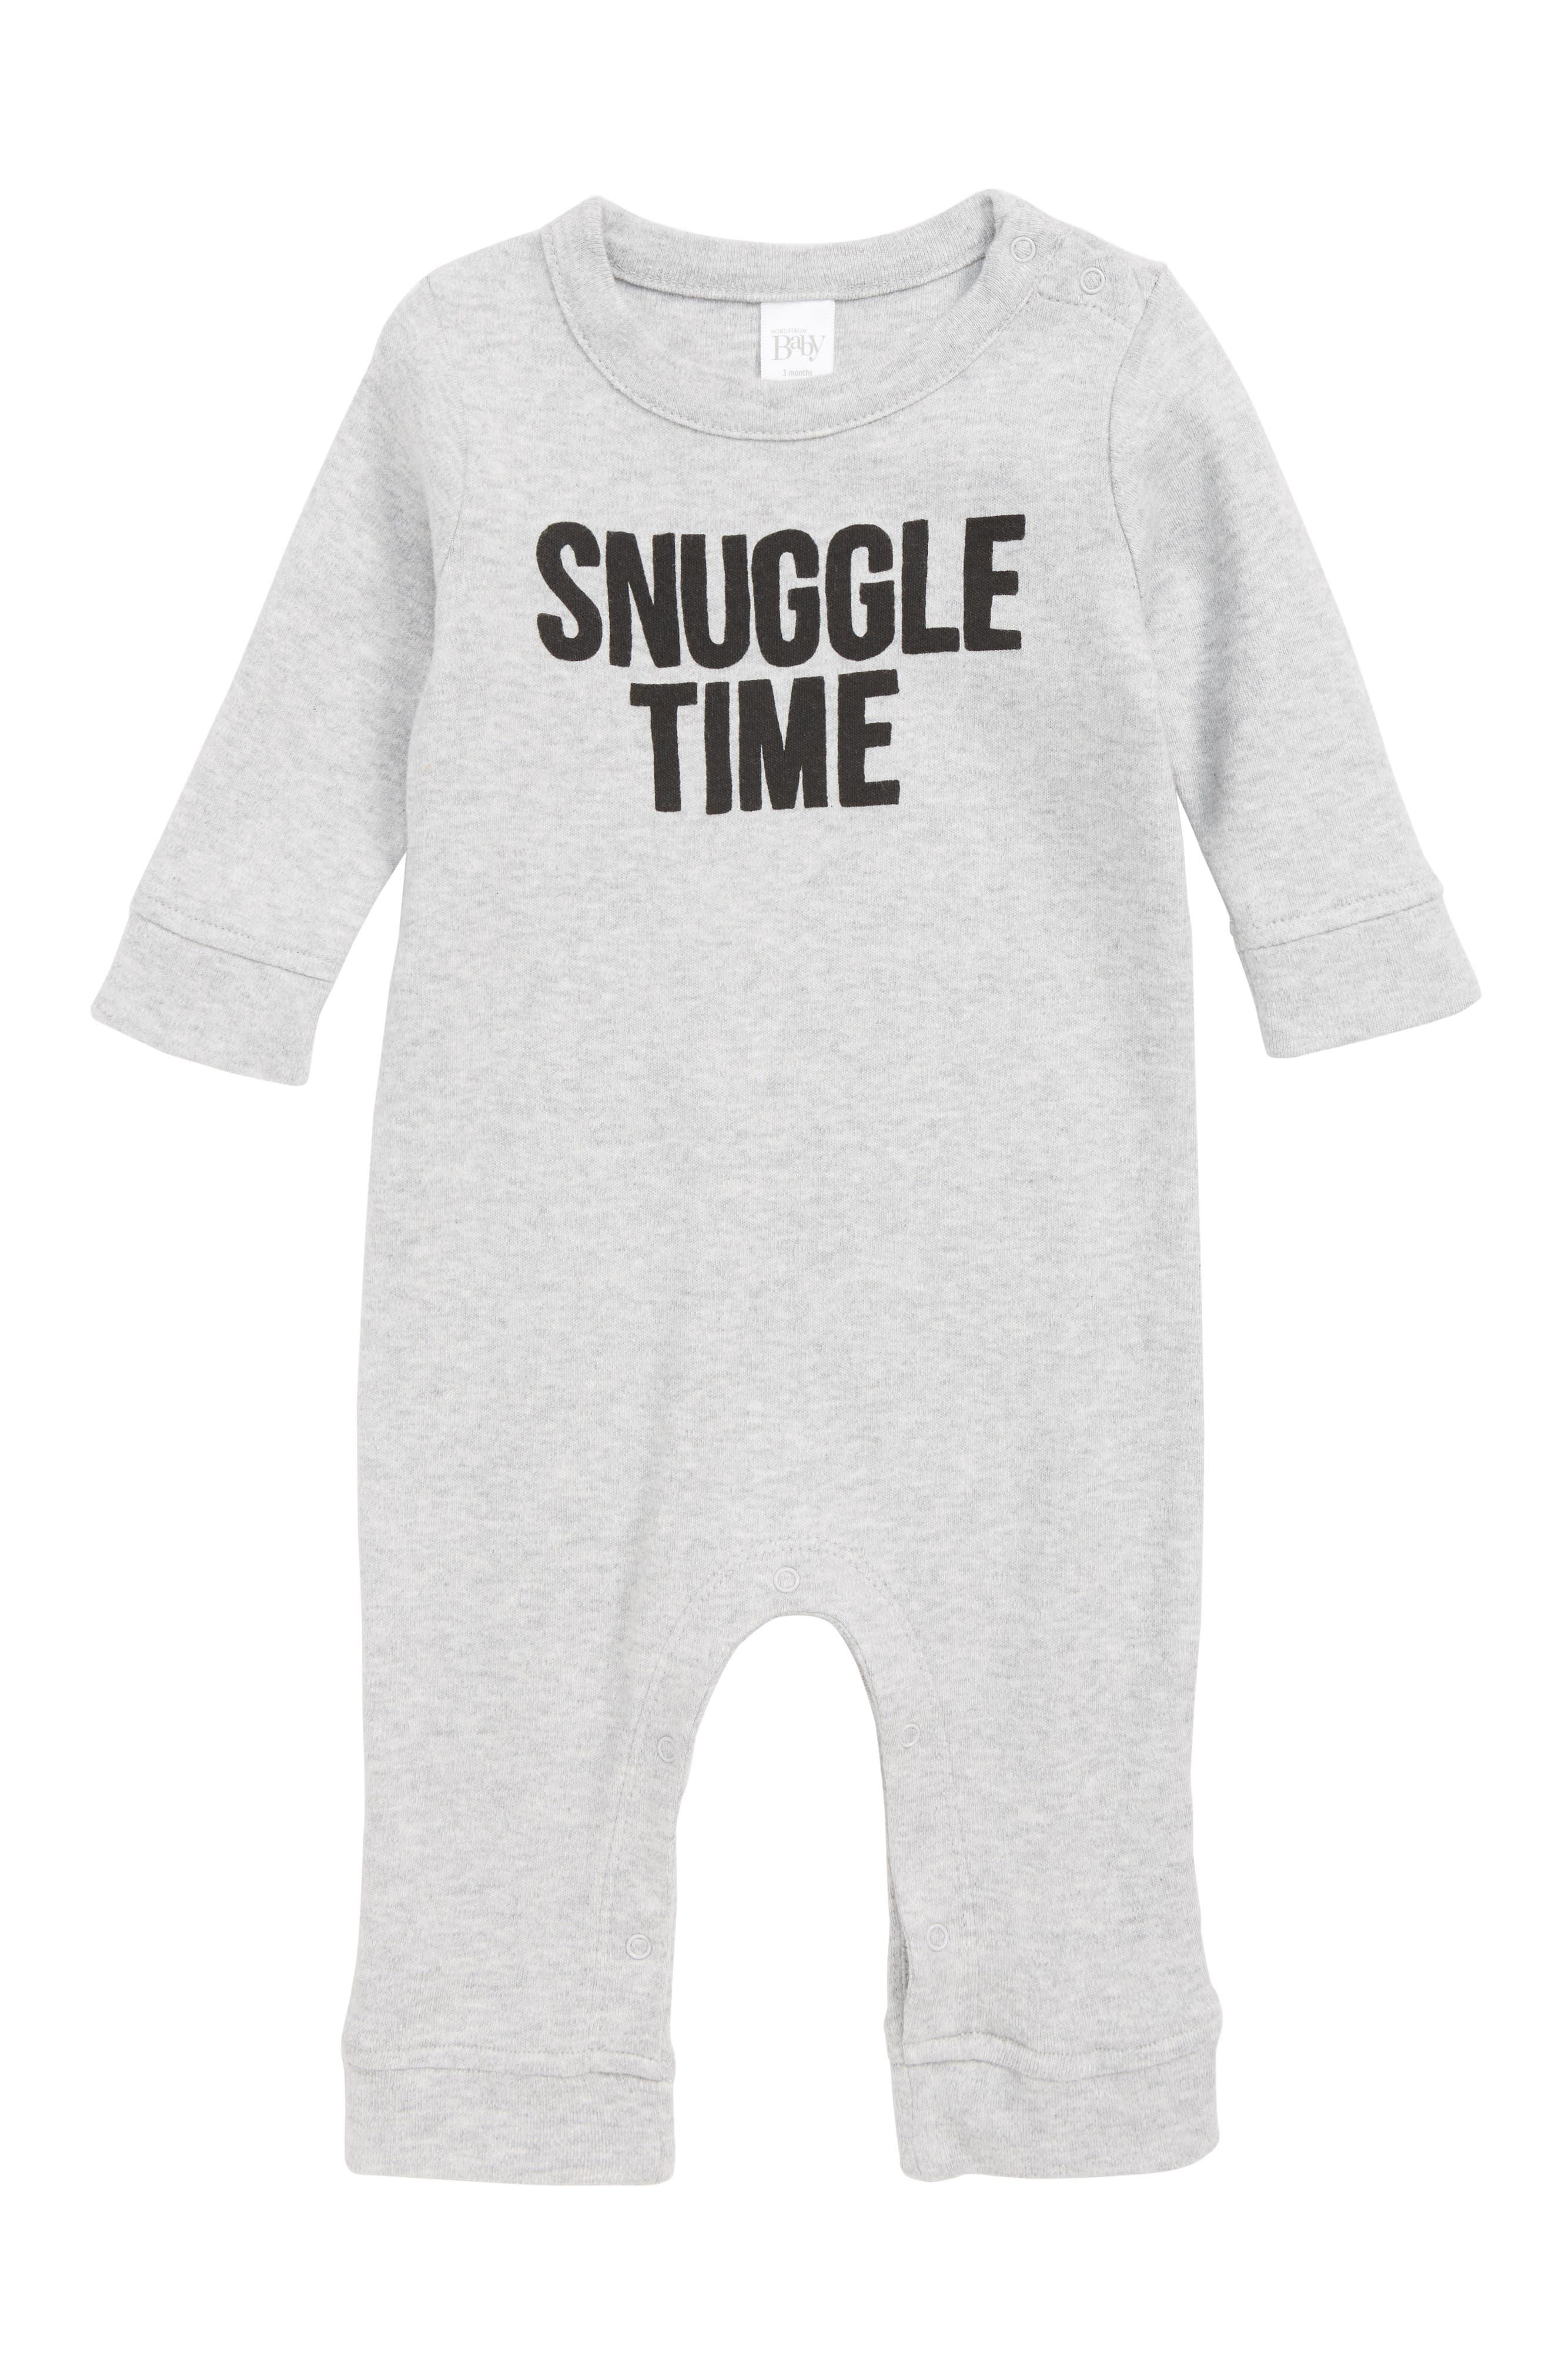 Snuggle Time Romper,                         Main,                         color, 030